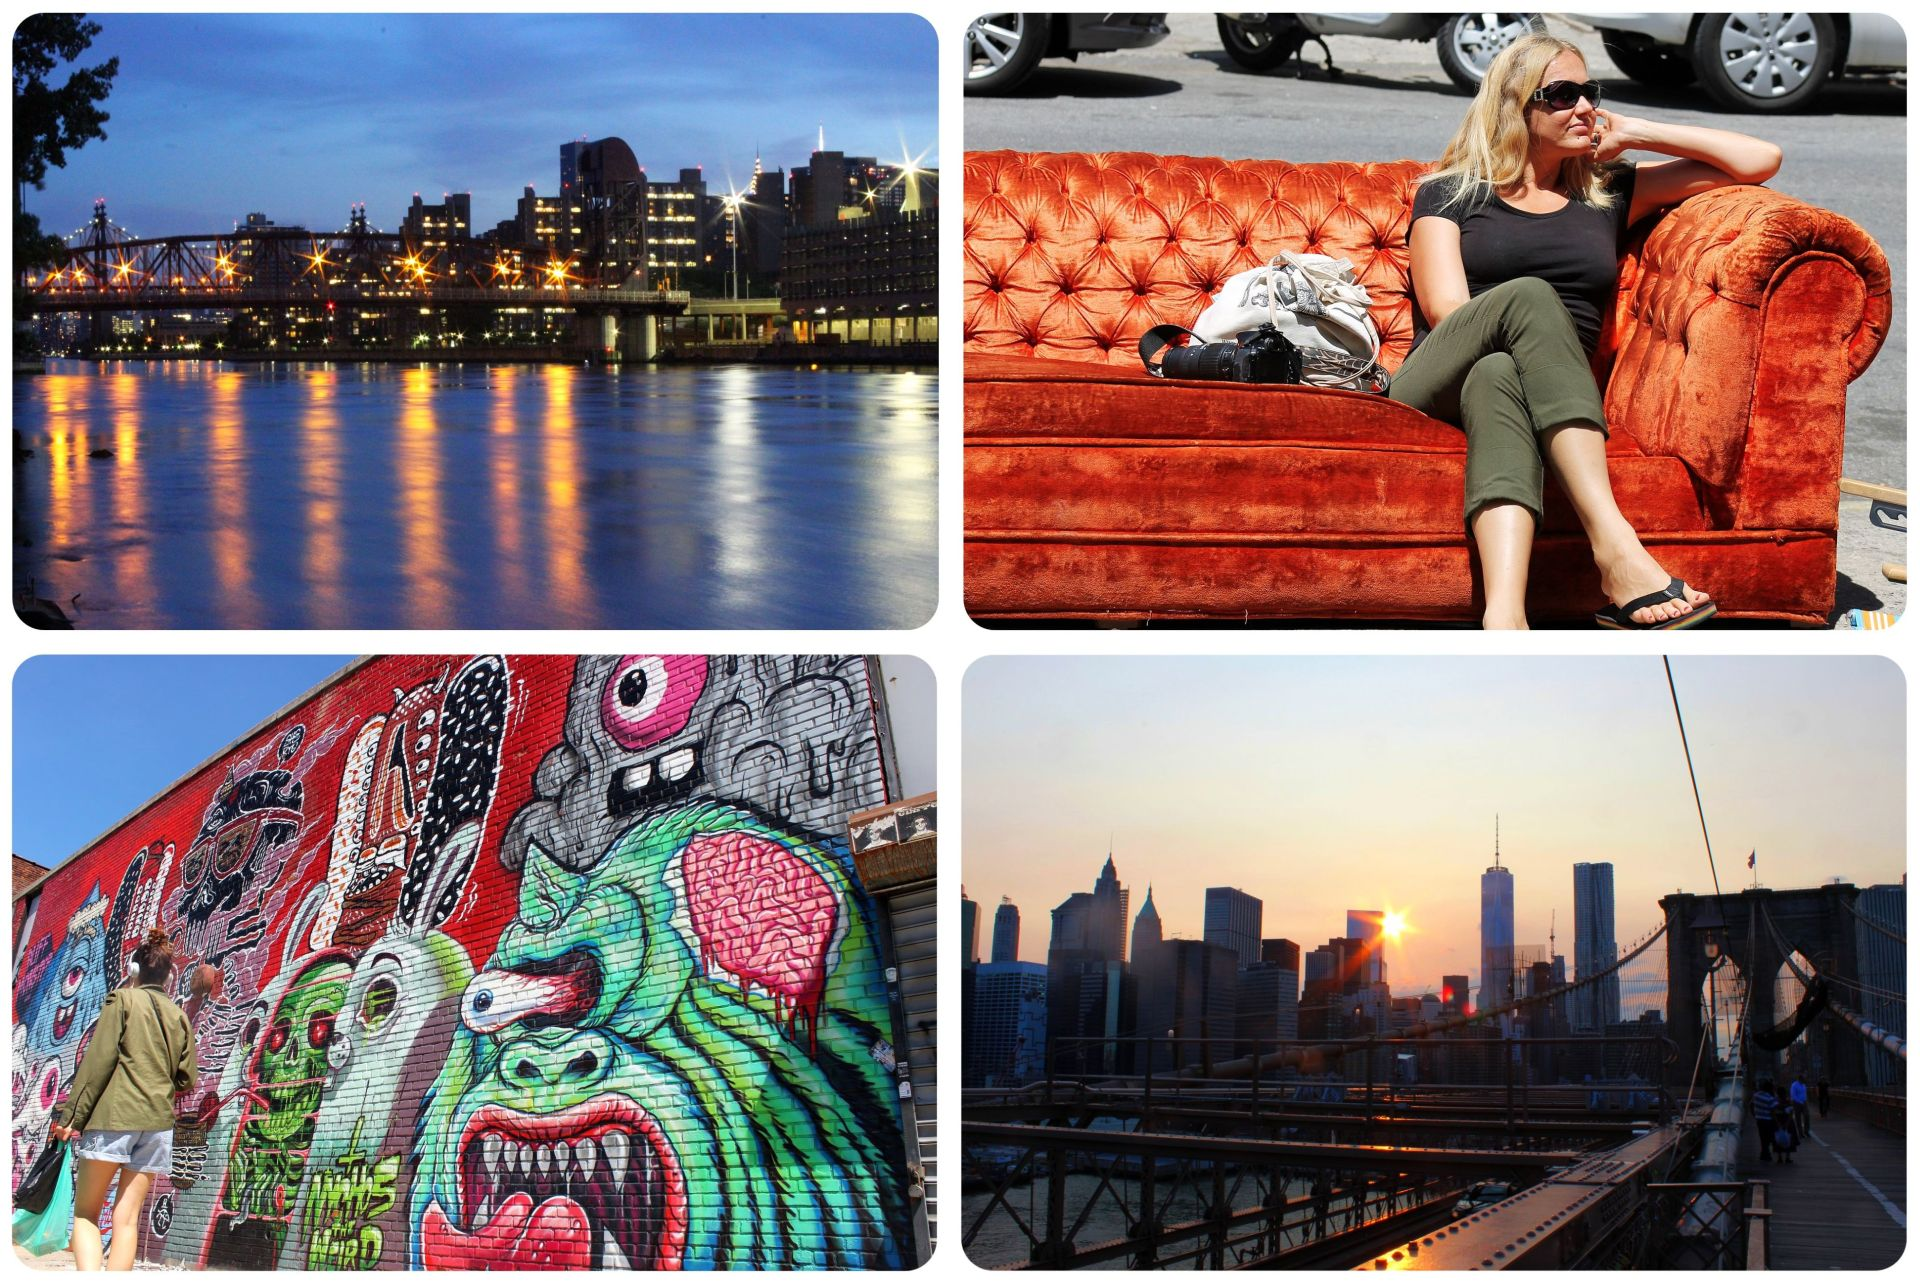 New York Summer 2015